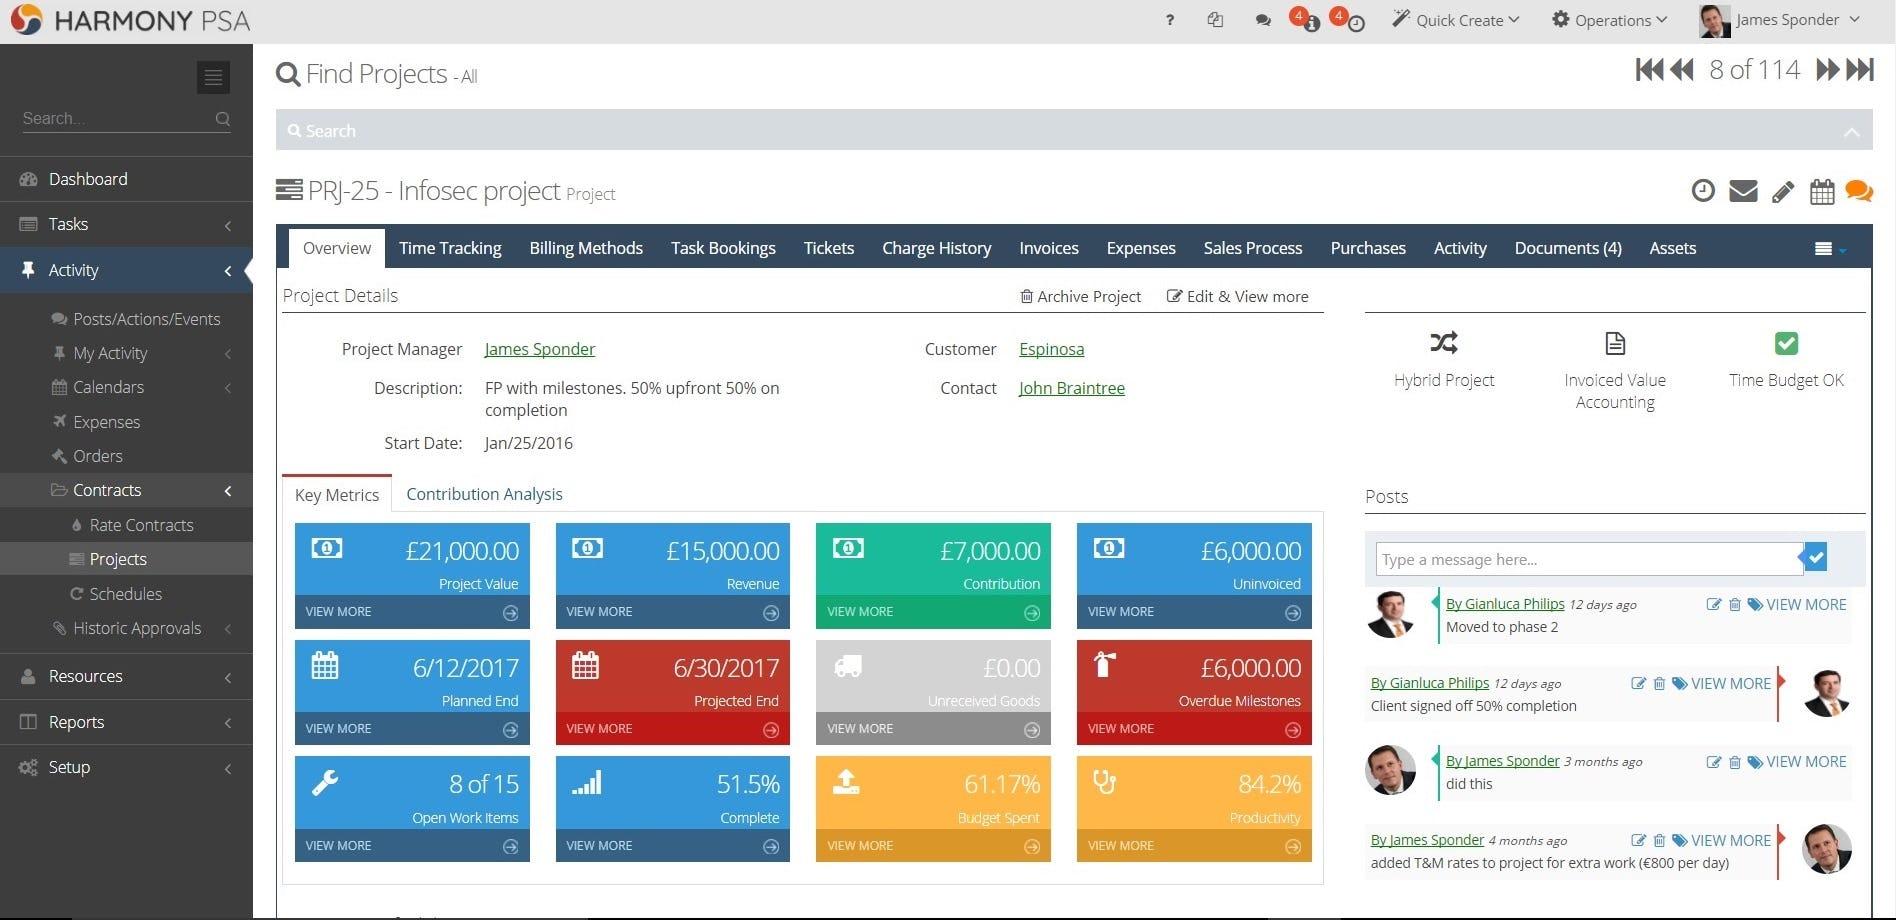 HarmonyPSA Software - Project